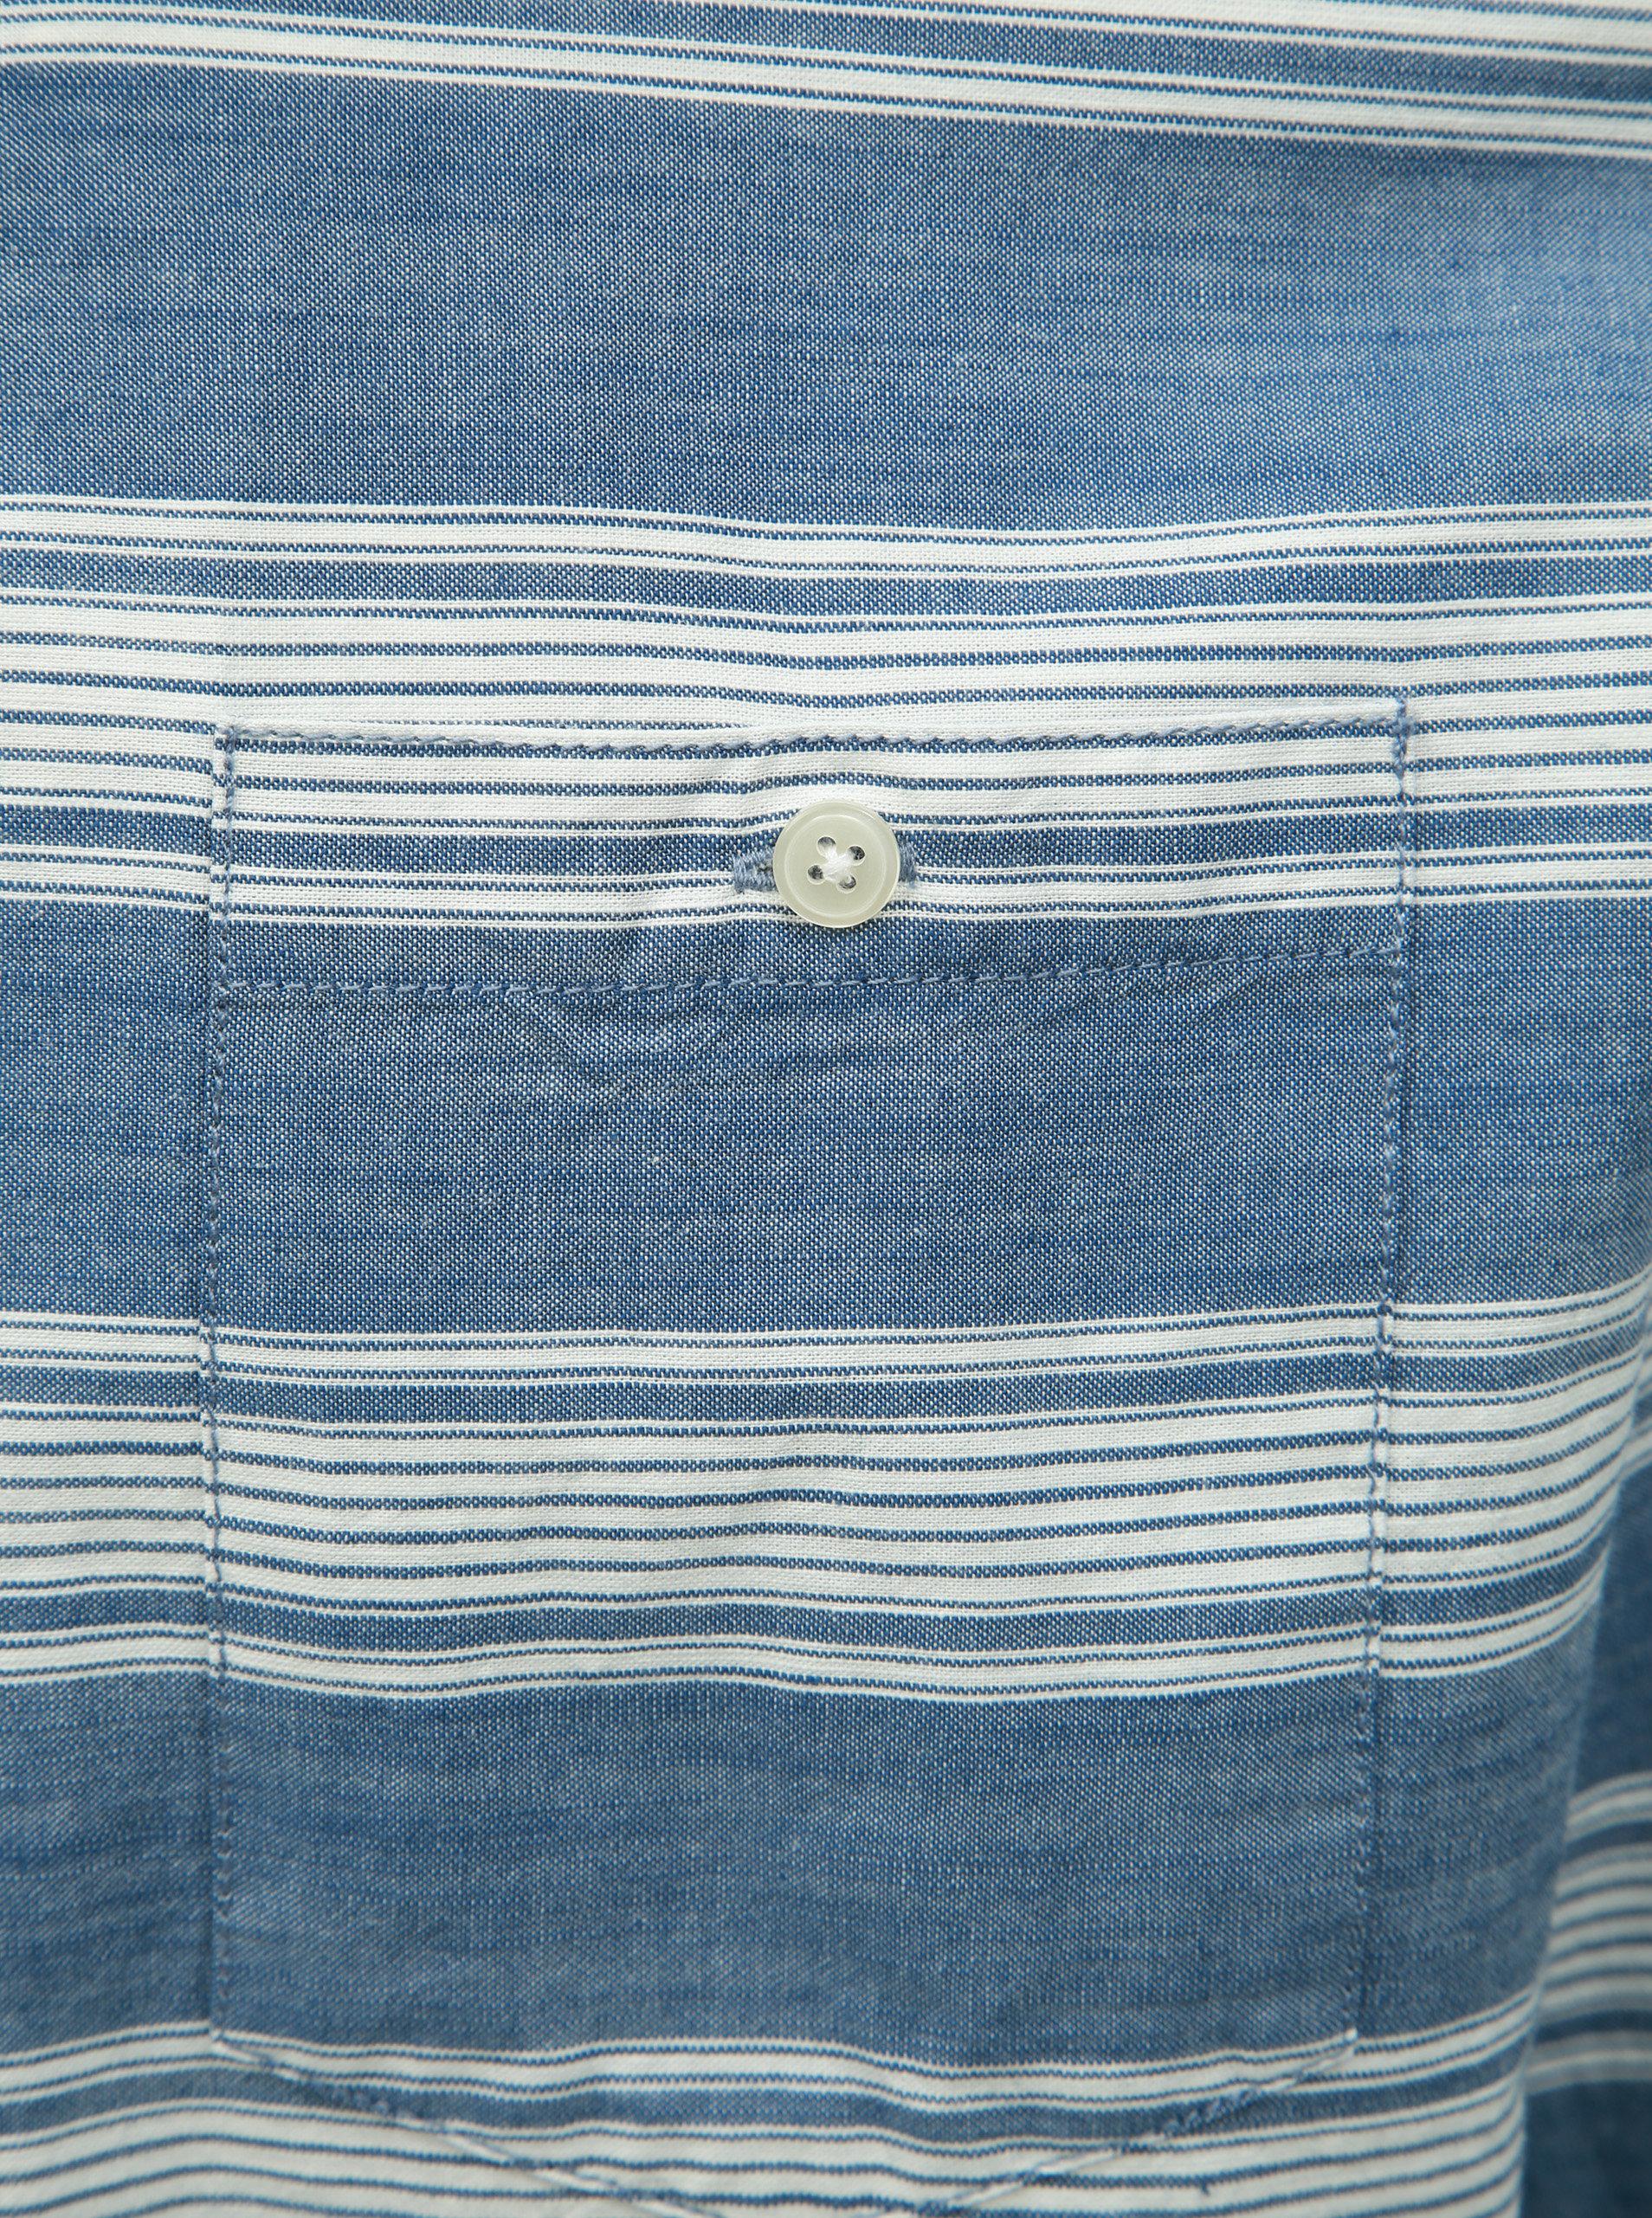 7d02e6dcc5e1 Bielo–modrá pruhovaná košeľa Shine Original